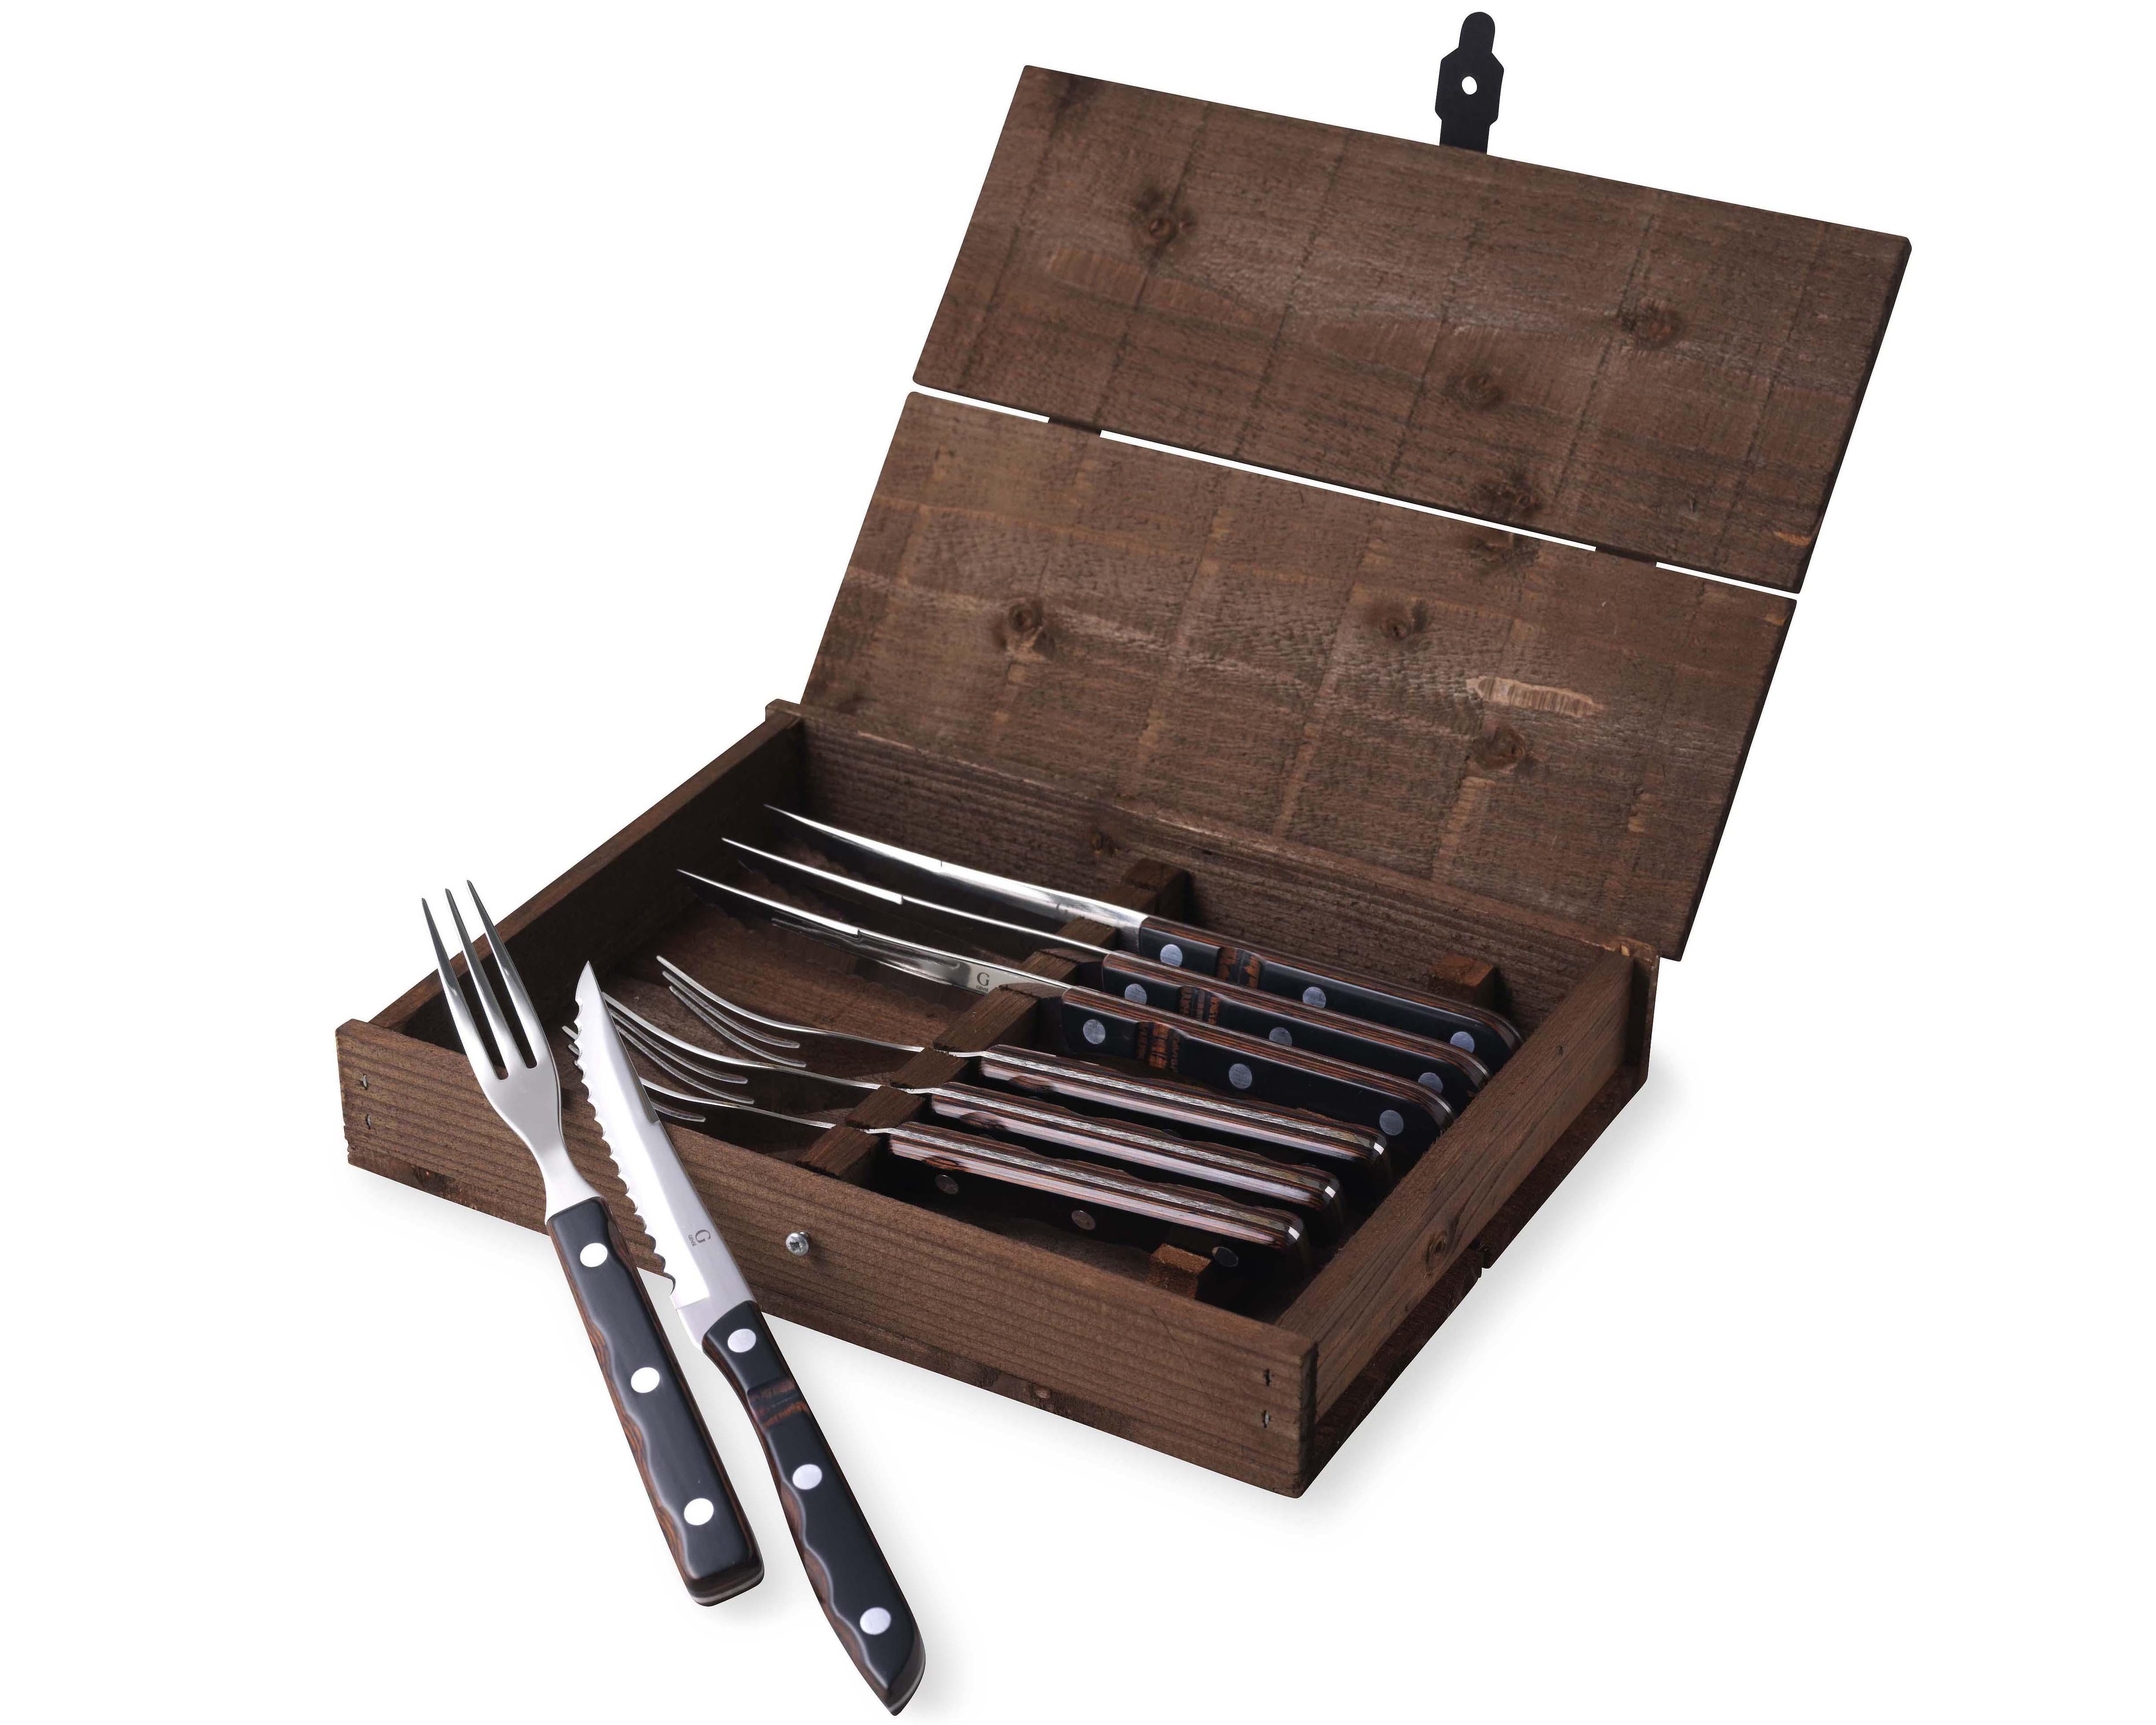 Gense - Old Farmer Classic Steak Cutlery 4 Set - Brown Wood/Steel (704893)